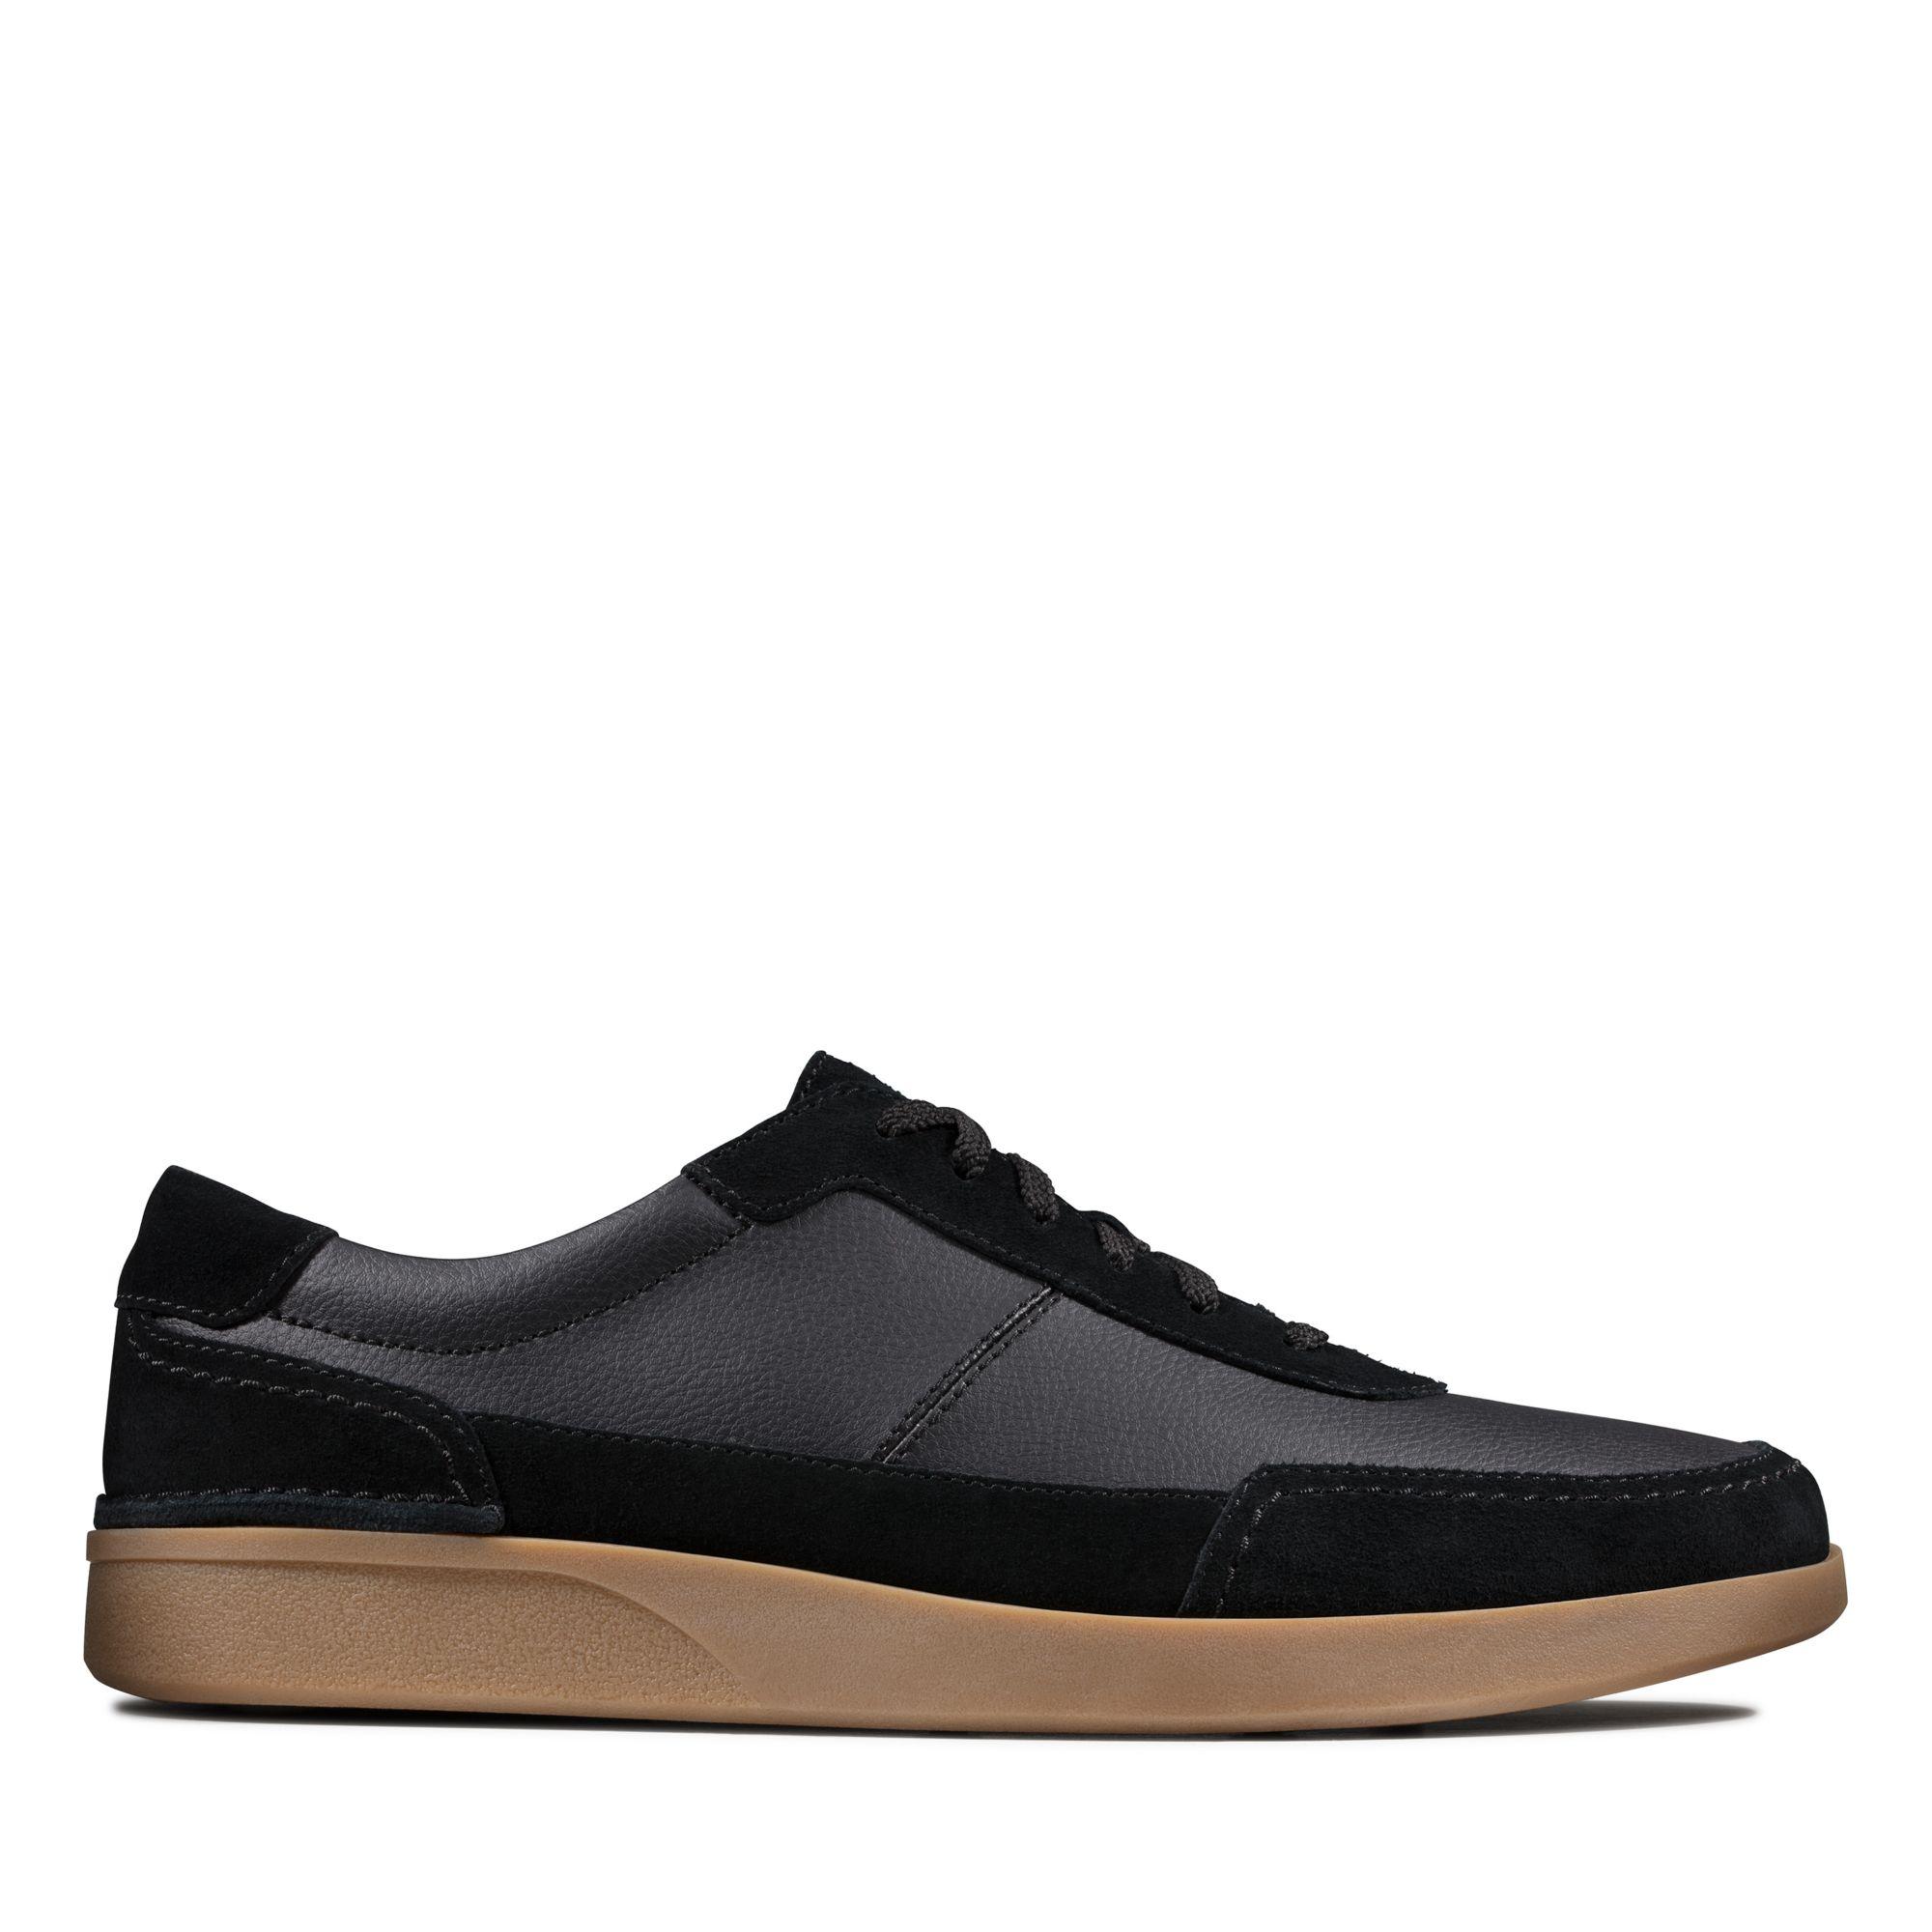 Clarks Oakland Run – Leather